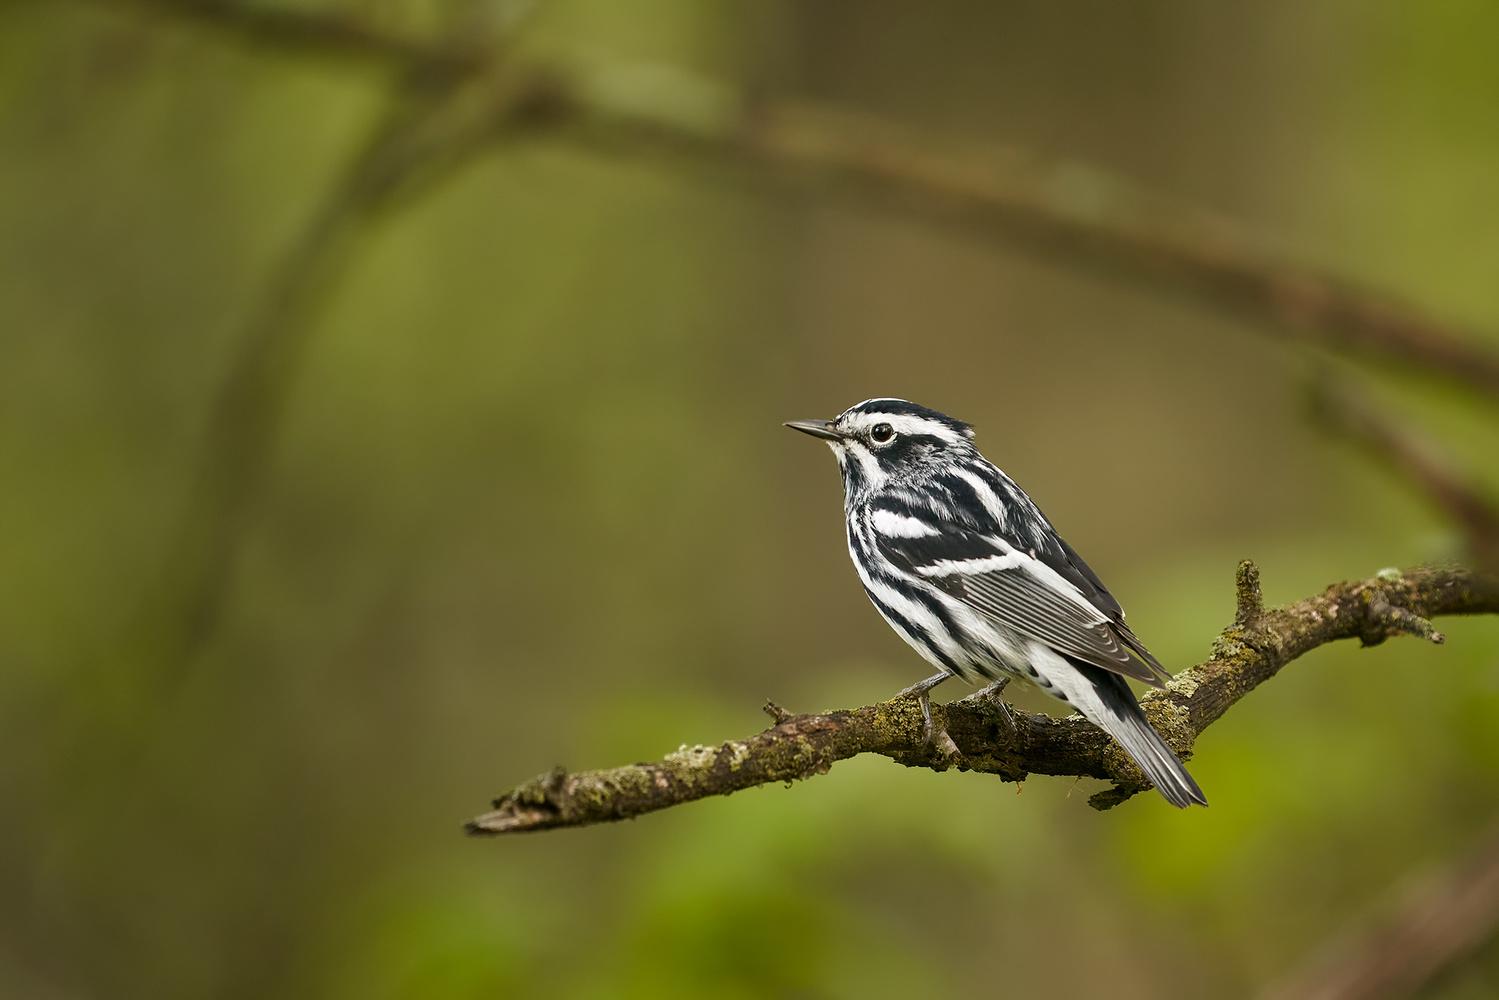 Black-and-white Warbler by Ryan Mense